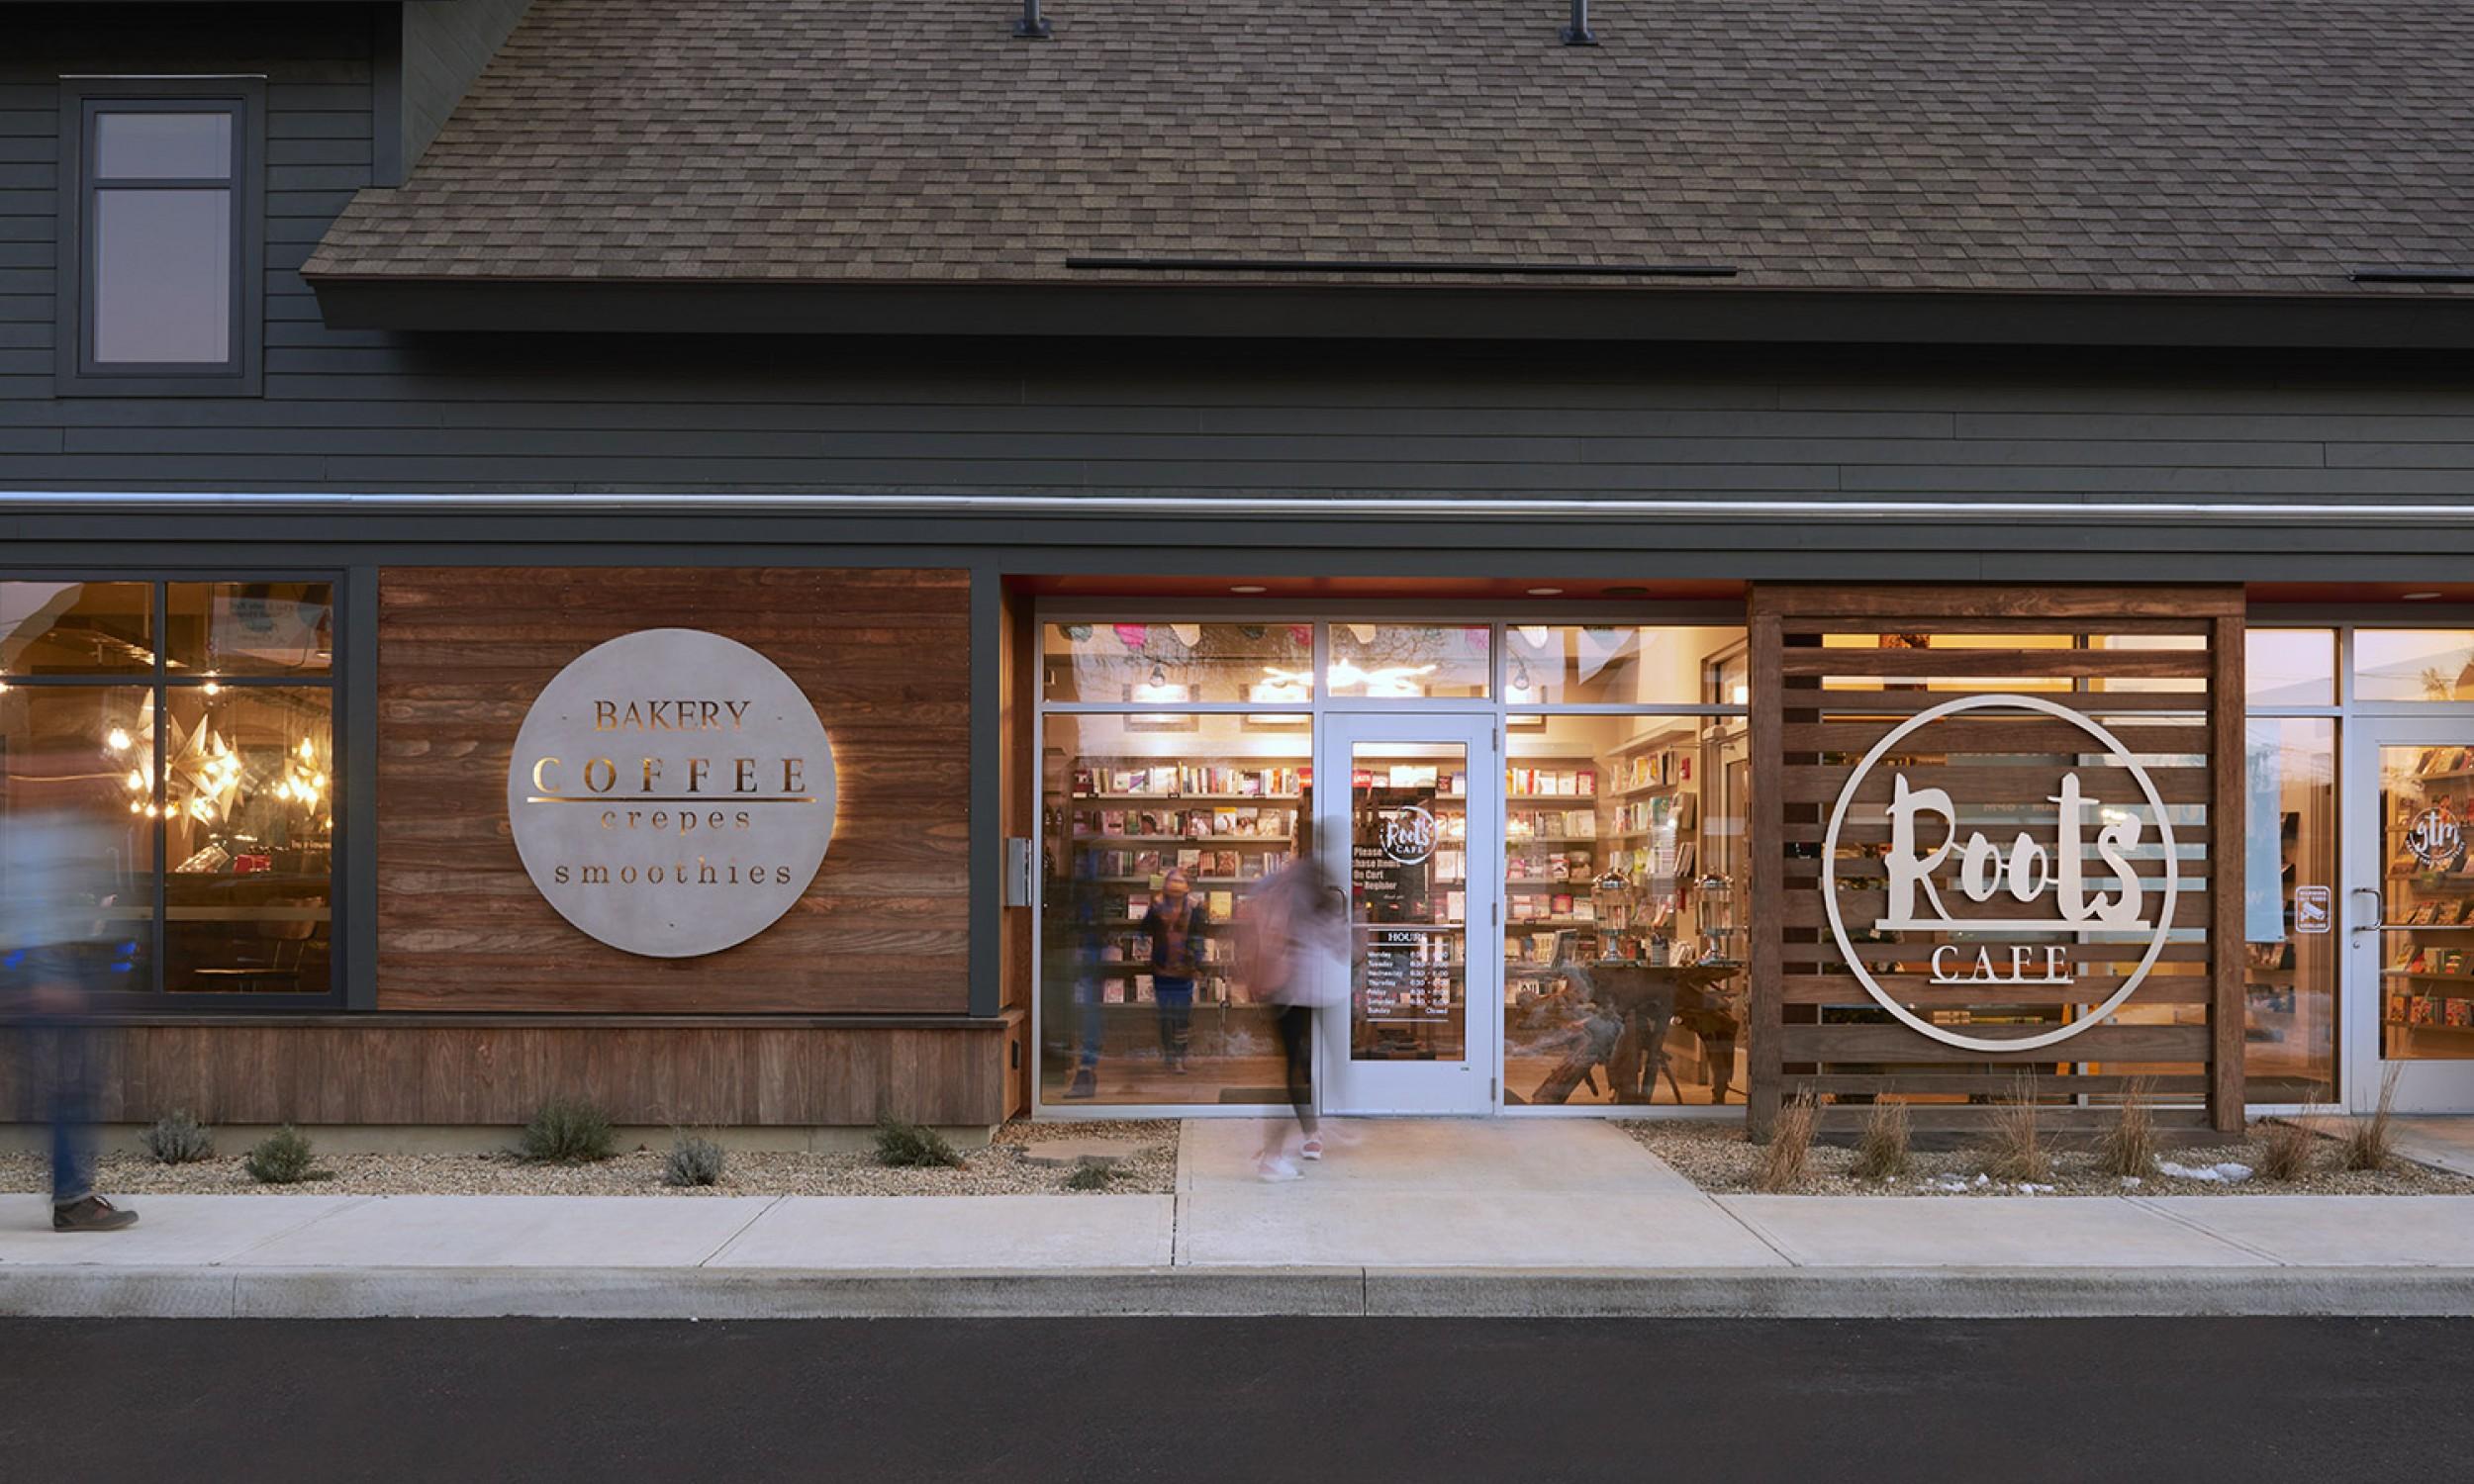 Kebony wood, Wood Screen, Restaurant design, Maine Architect, Coffee Shop, Storefront windows